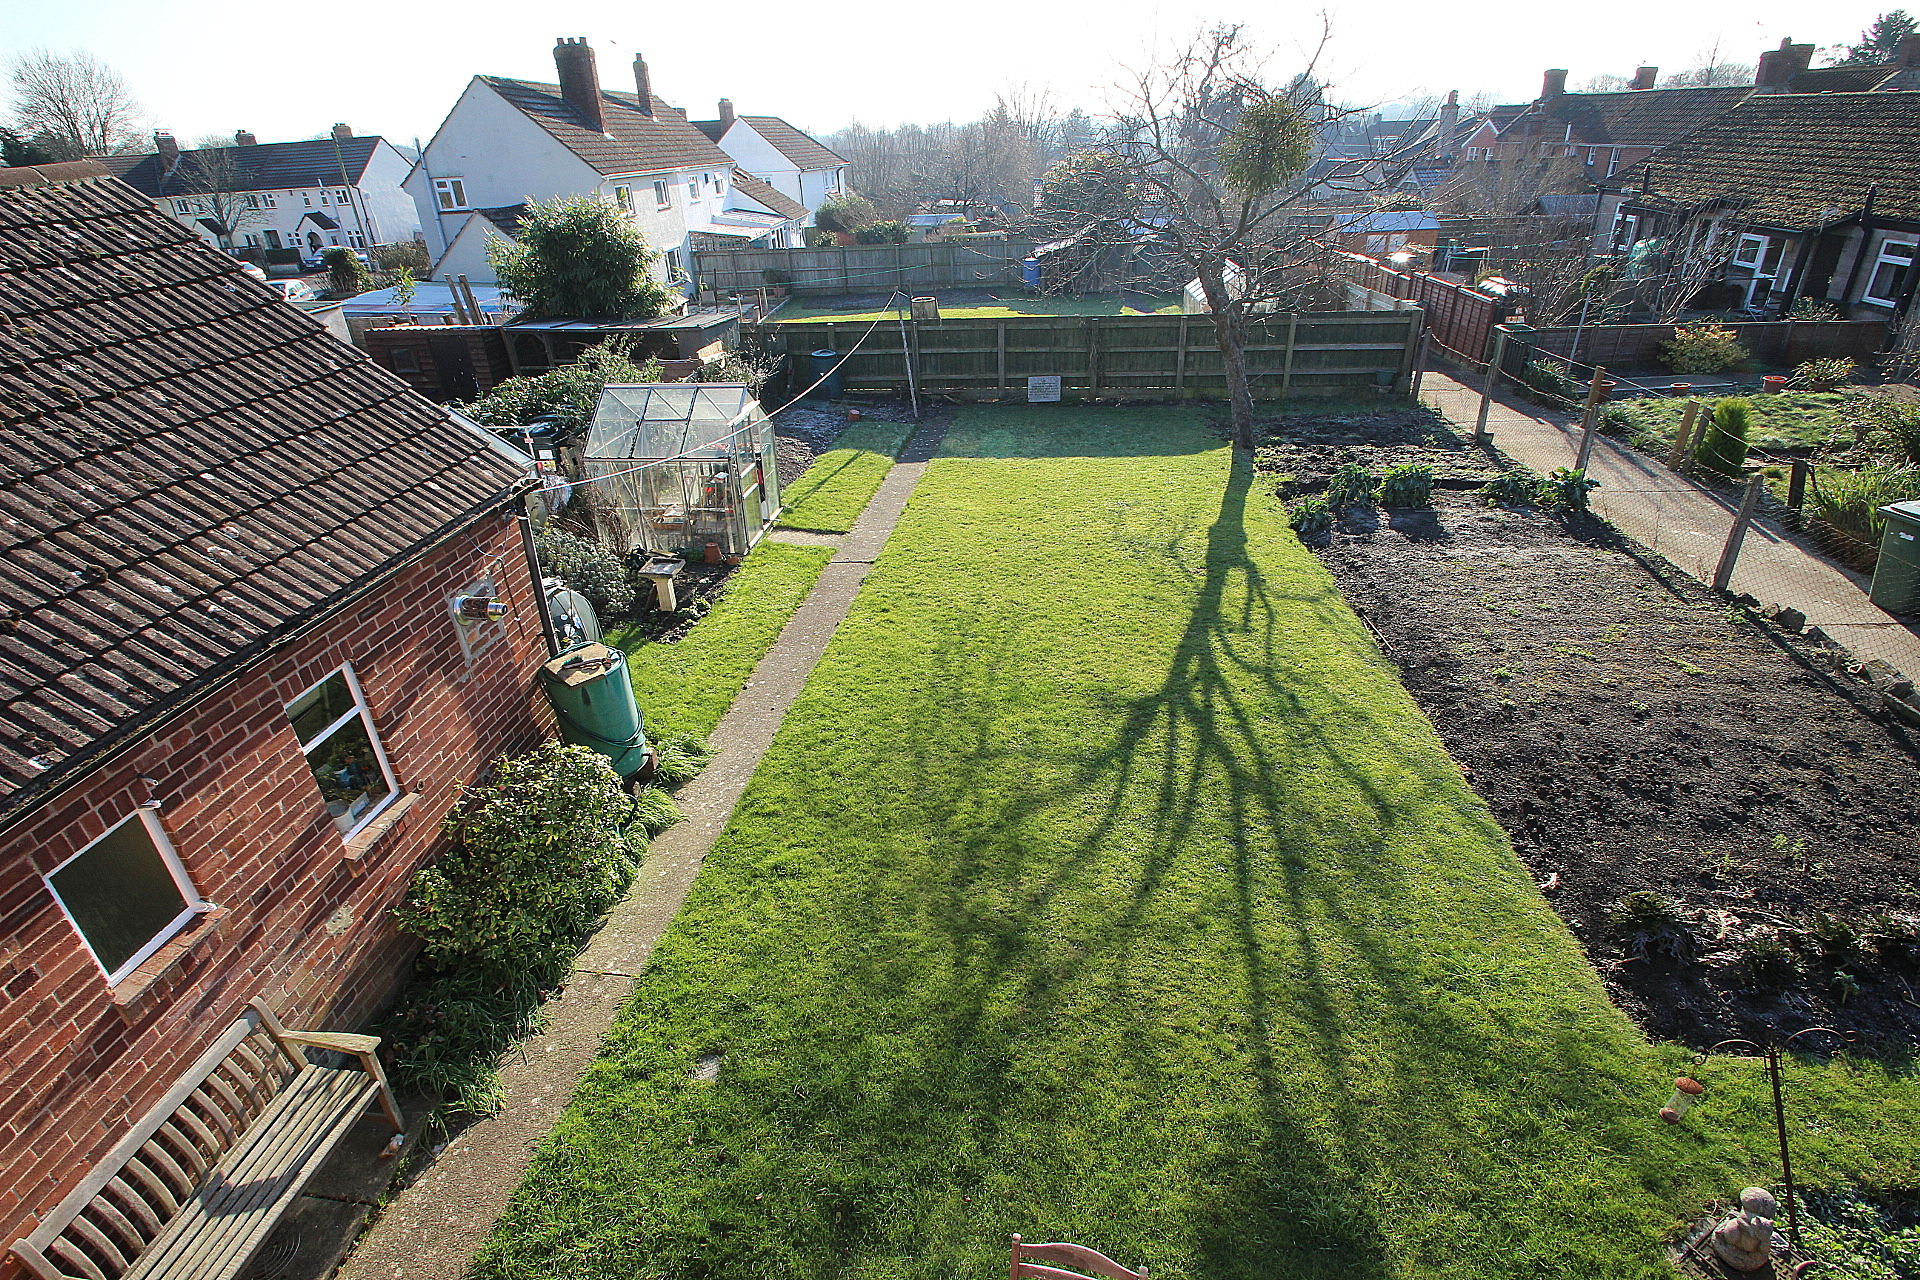 3 bedroom house for sale in baltonsborough for 1 park terrace glastonbury